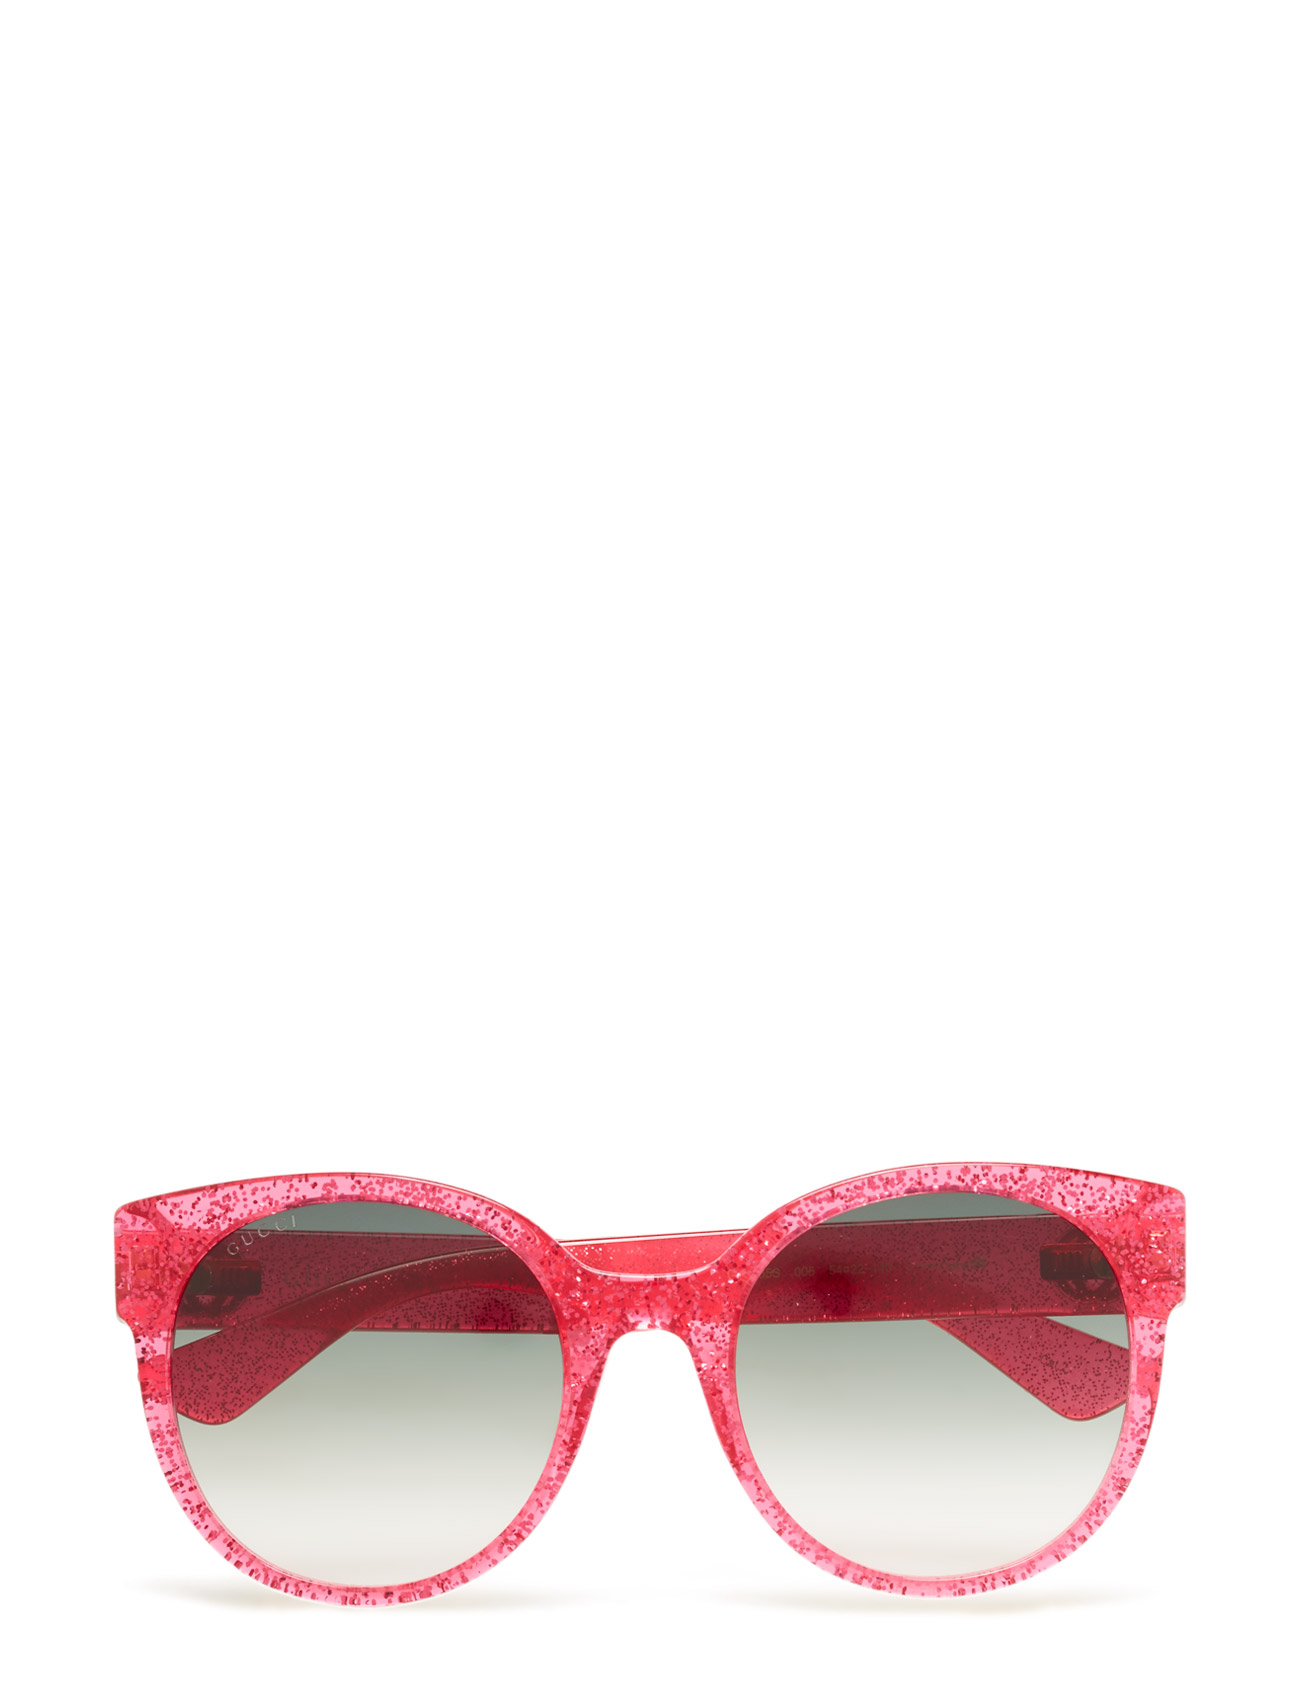 Gg0035s Gucci Sunglasses Solbriller til Damer i